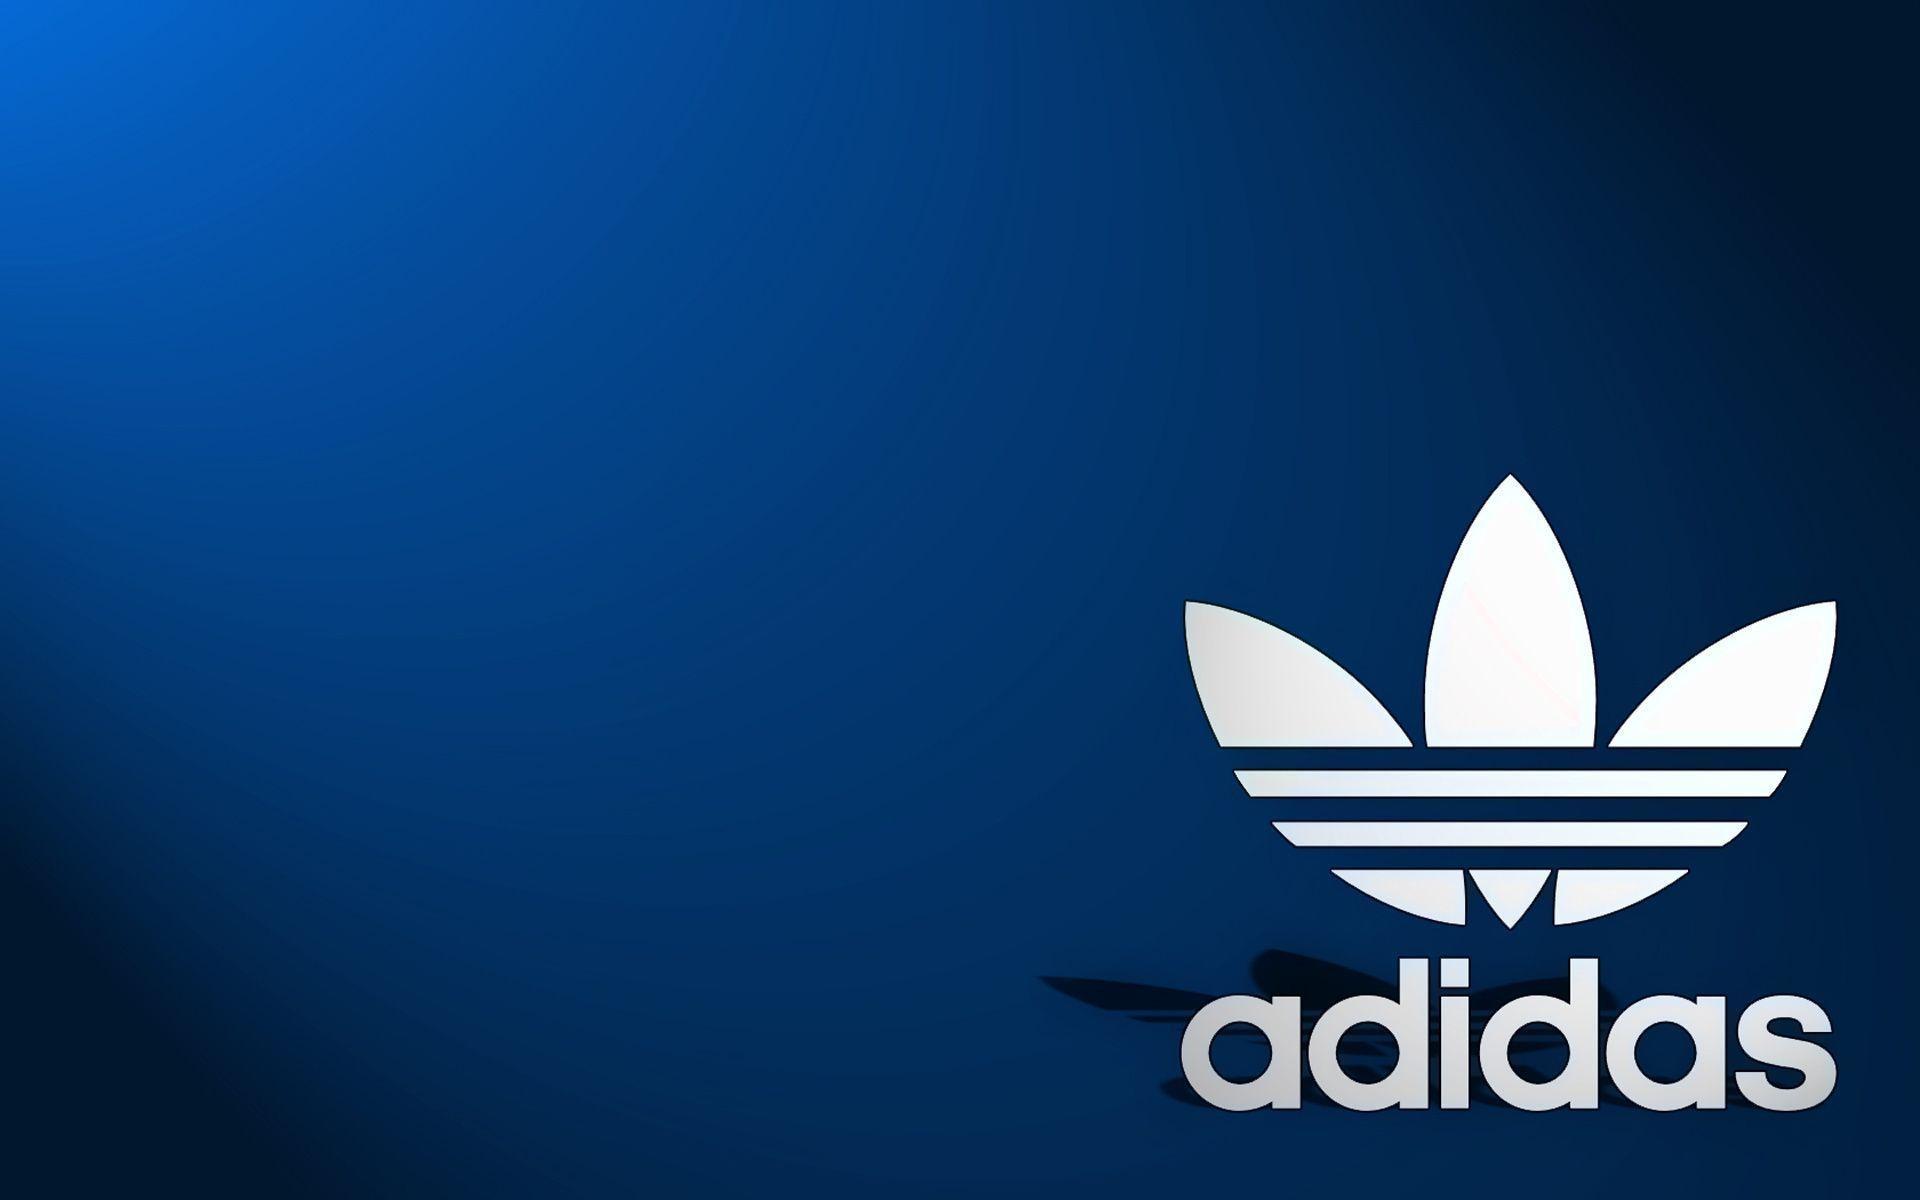 Adidas wallpaper blue